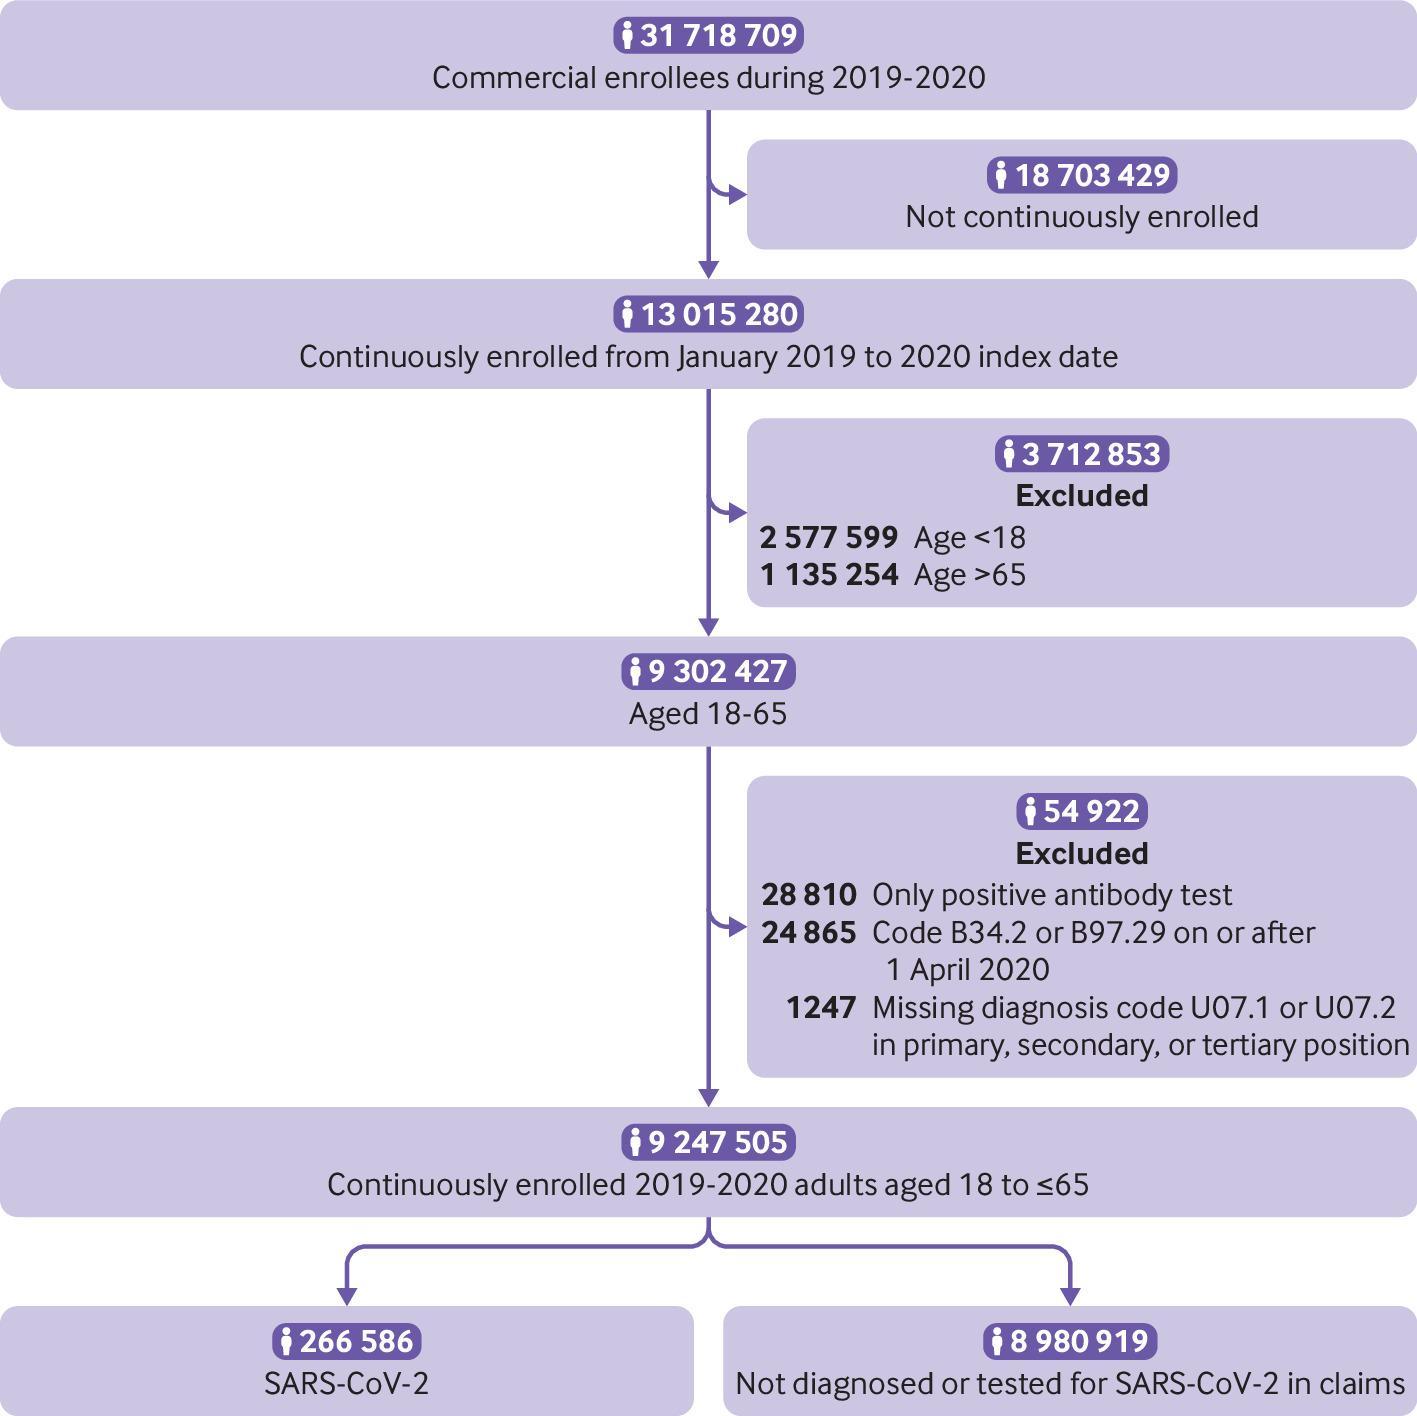 [BMJ发表论文]:新冠病毒感染急性期后临床后遗症的风险